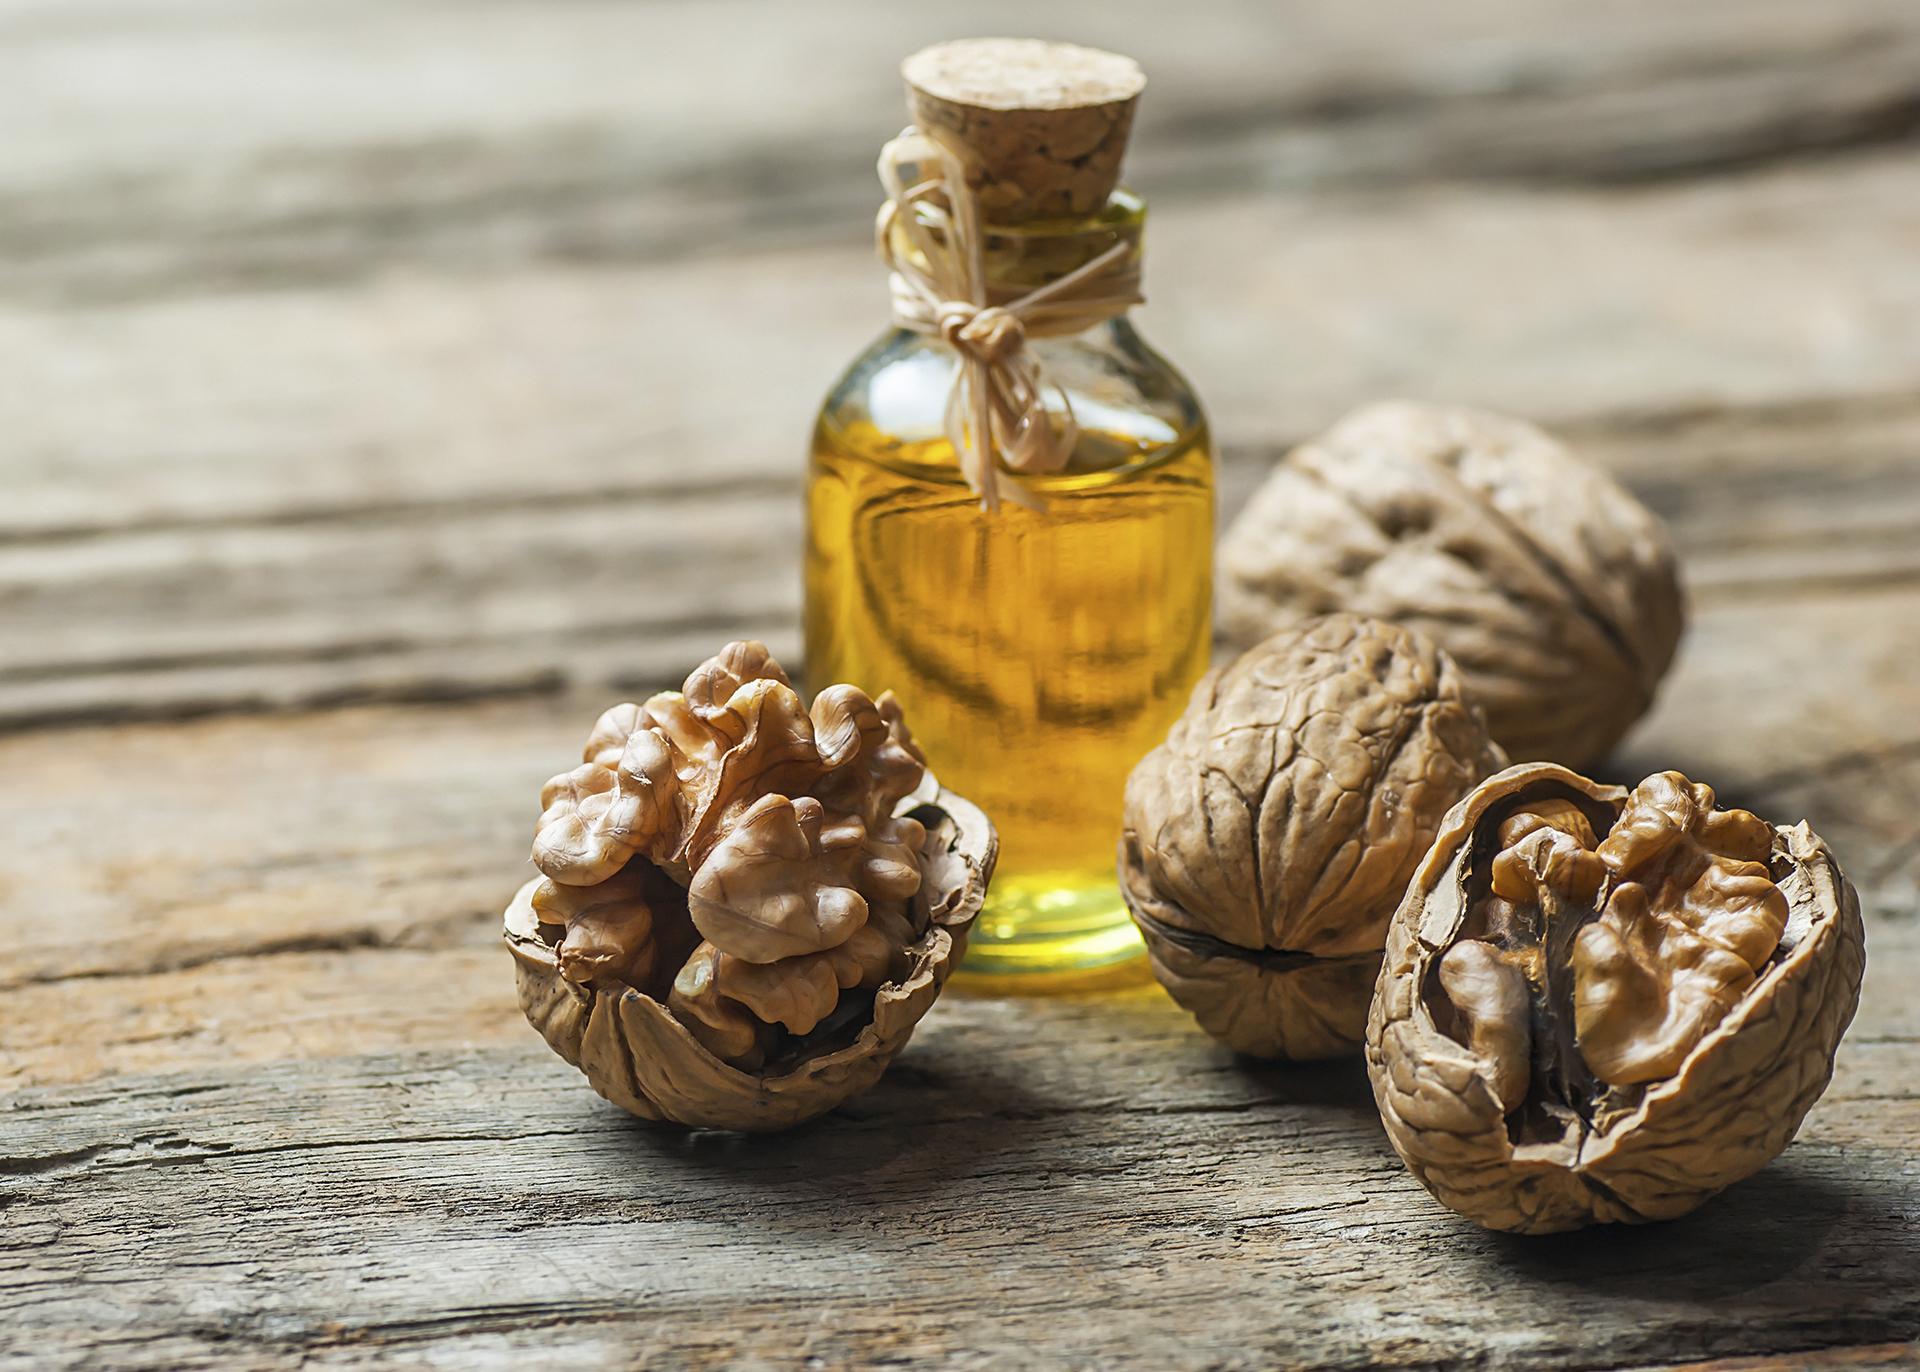 Walnut-Oil_Henry-Lamotte-Oils